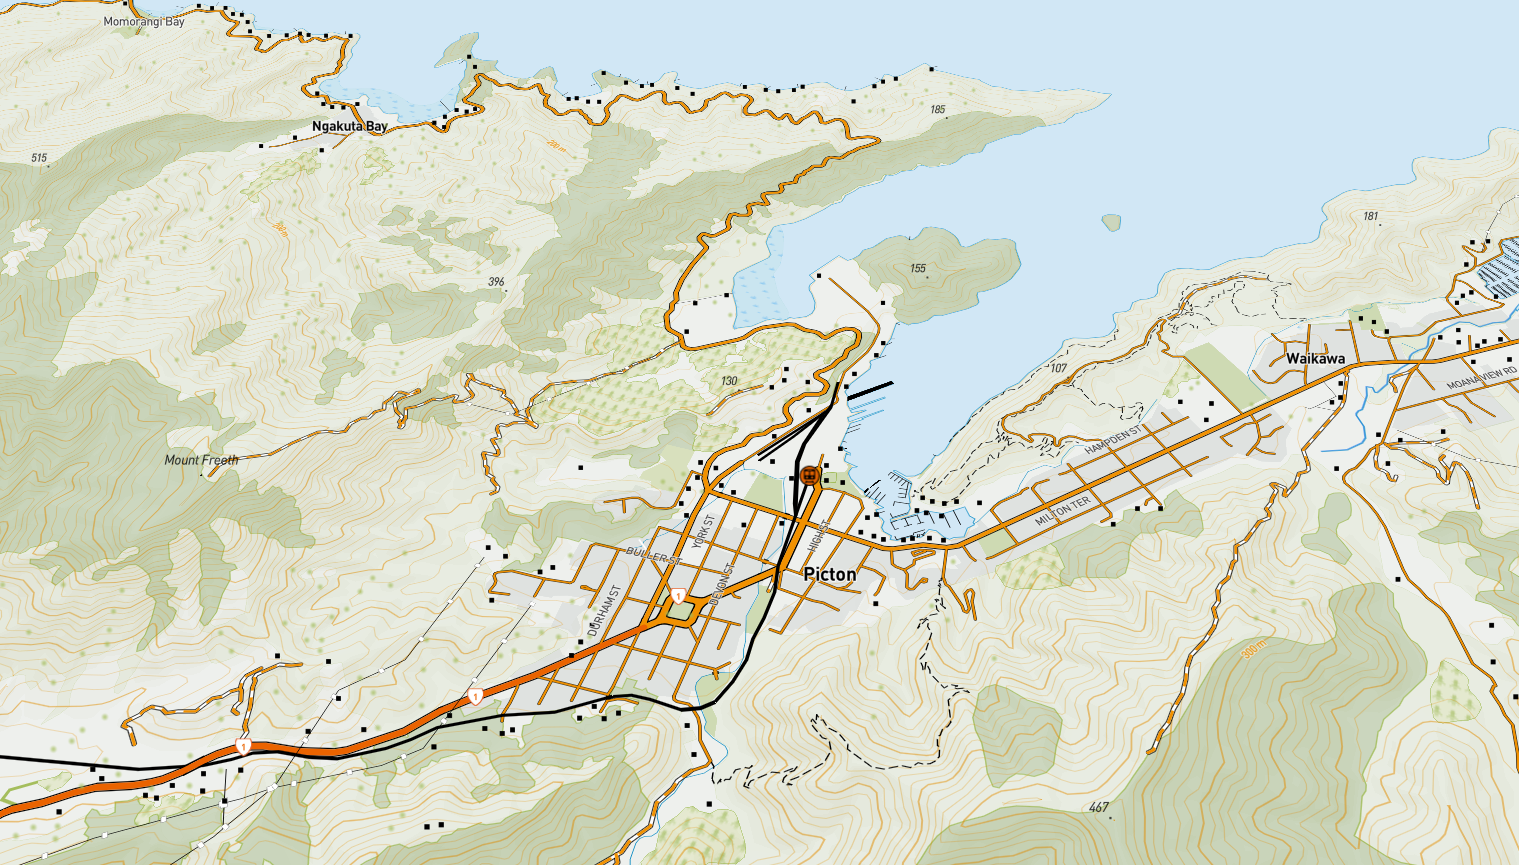 NZ Topo Web Map | The Map Kiwi